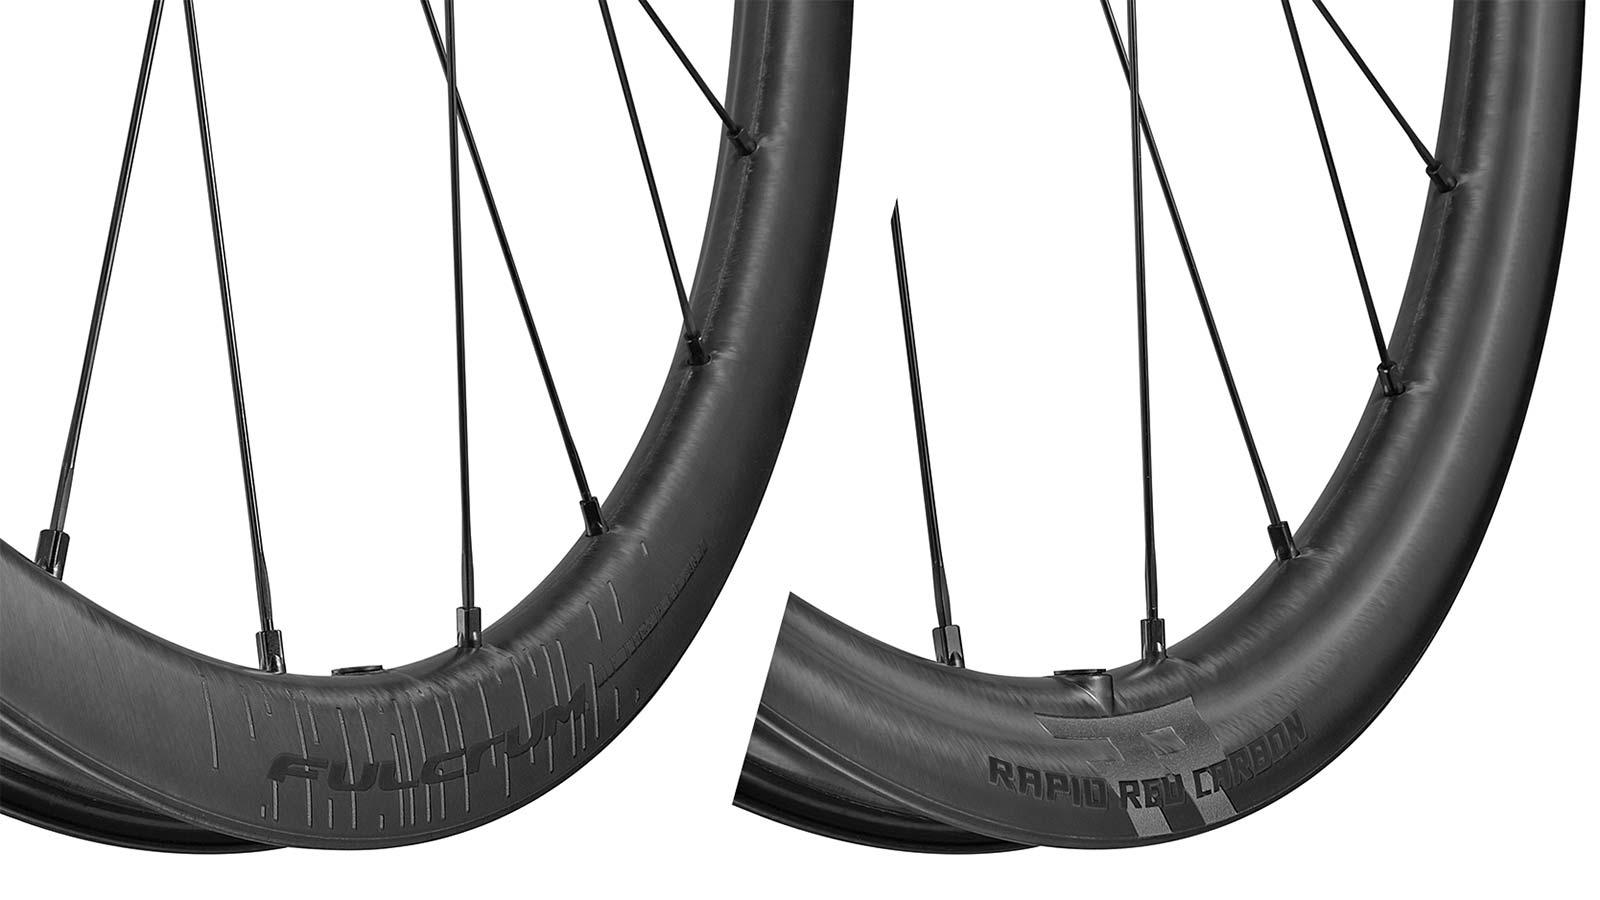 Fulcrum Rapid Red Carbon lightweight asymmetric tubeless gravel bike wheels,asymmetric rims